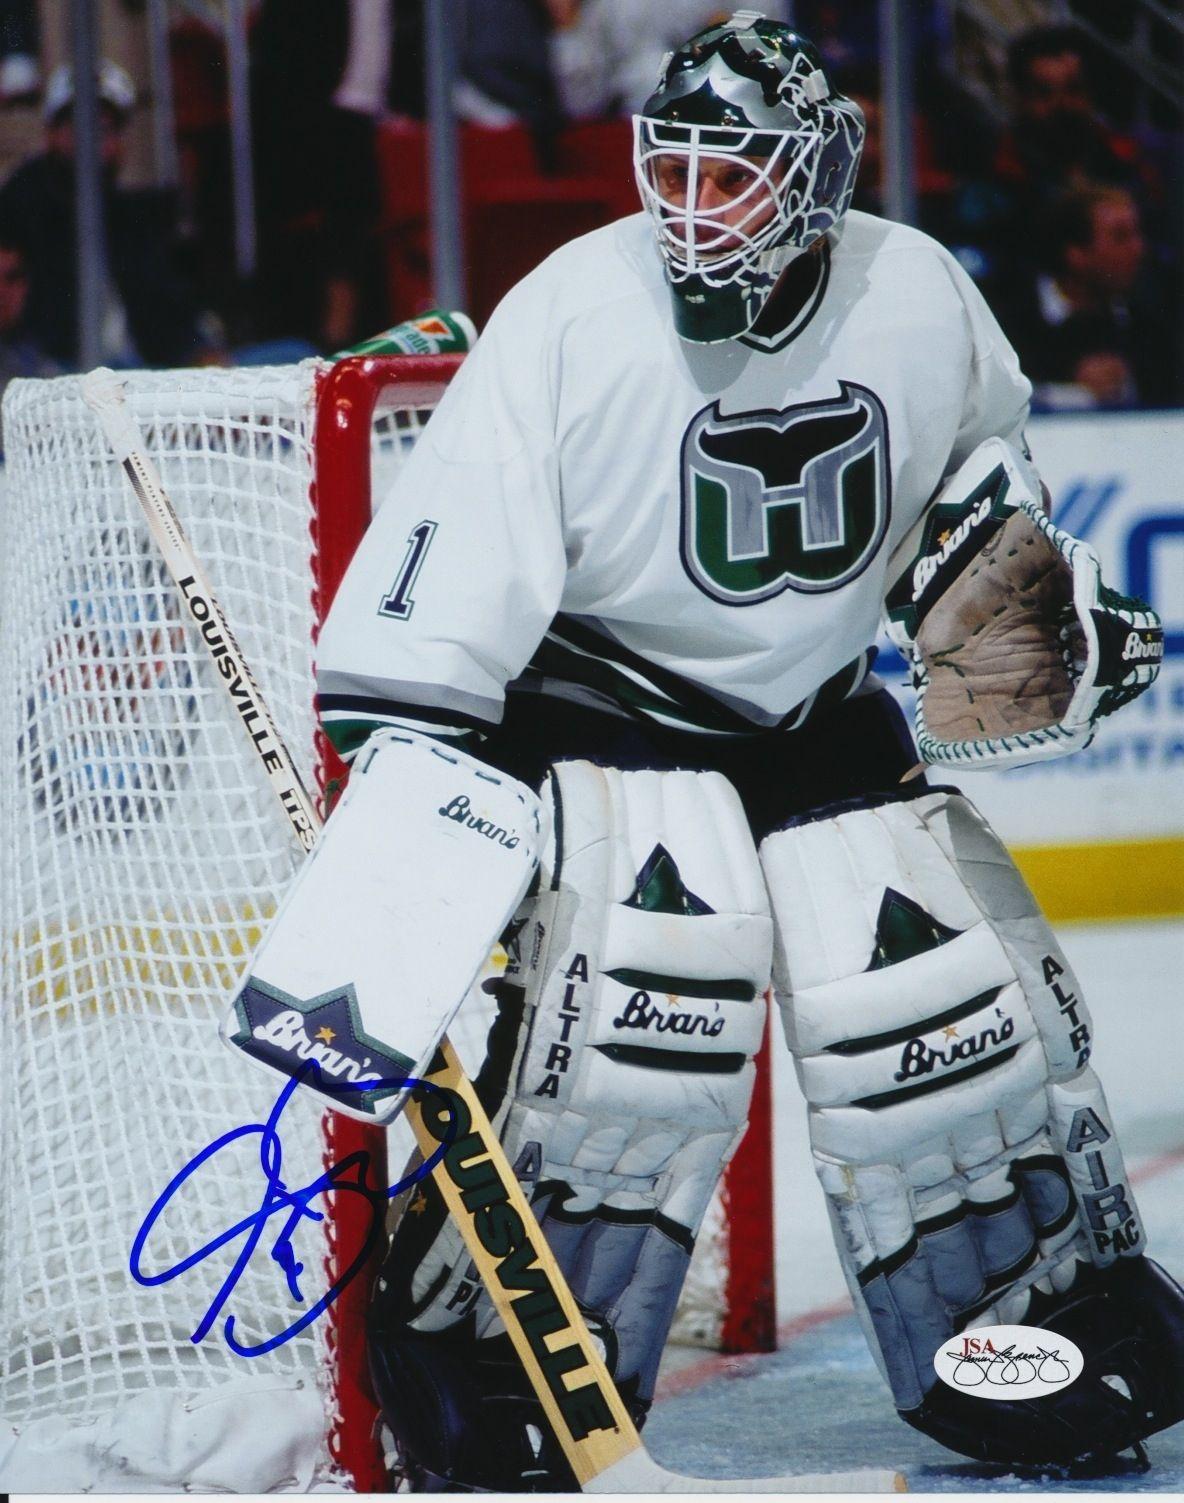 Burkeshartph002 Jpg 1184 1503 Nhl Players Hockey Goalie Hartford Whalers